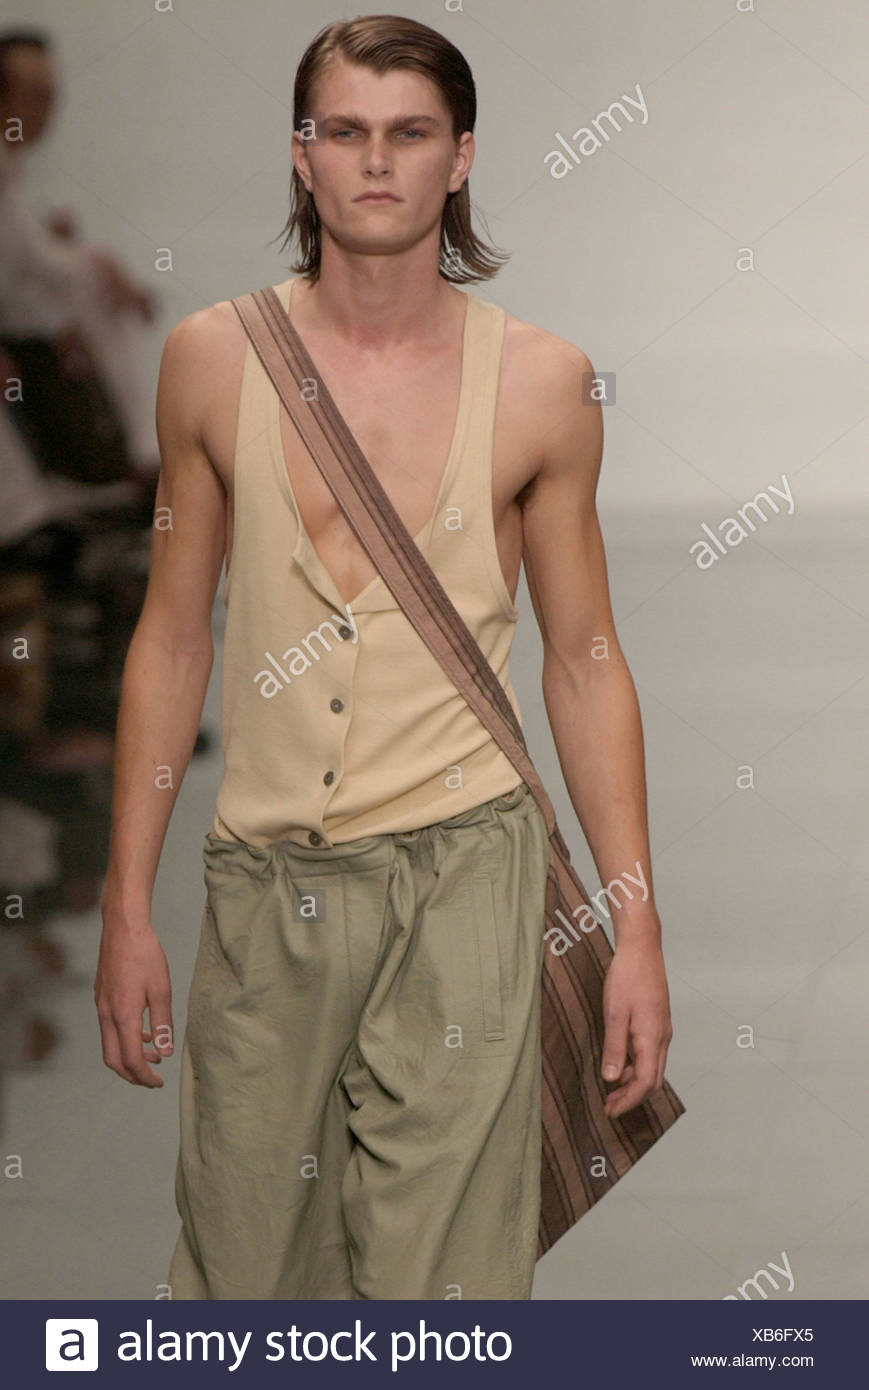 e93a16a76987 Burberry Ready to Wear Milan spring summer Menswear fashion show Model long  dark hair wearing beige